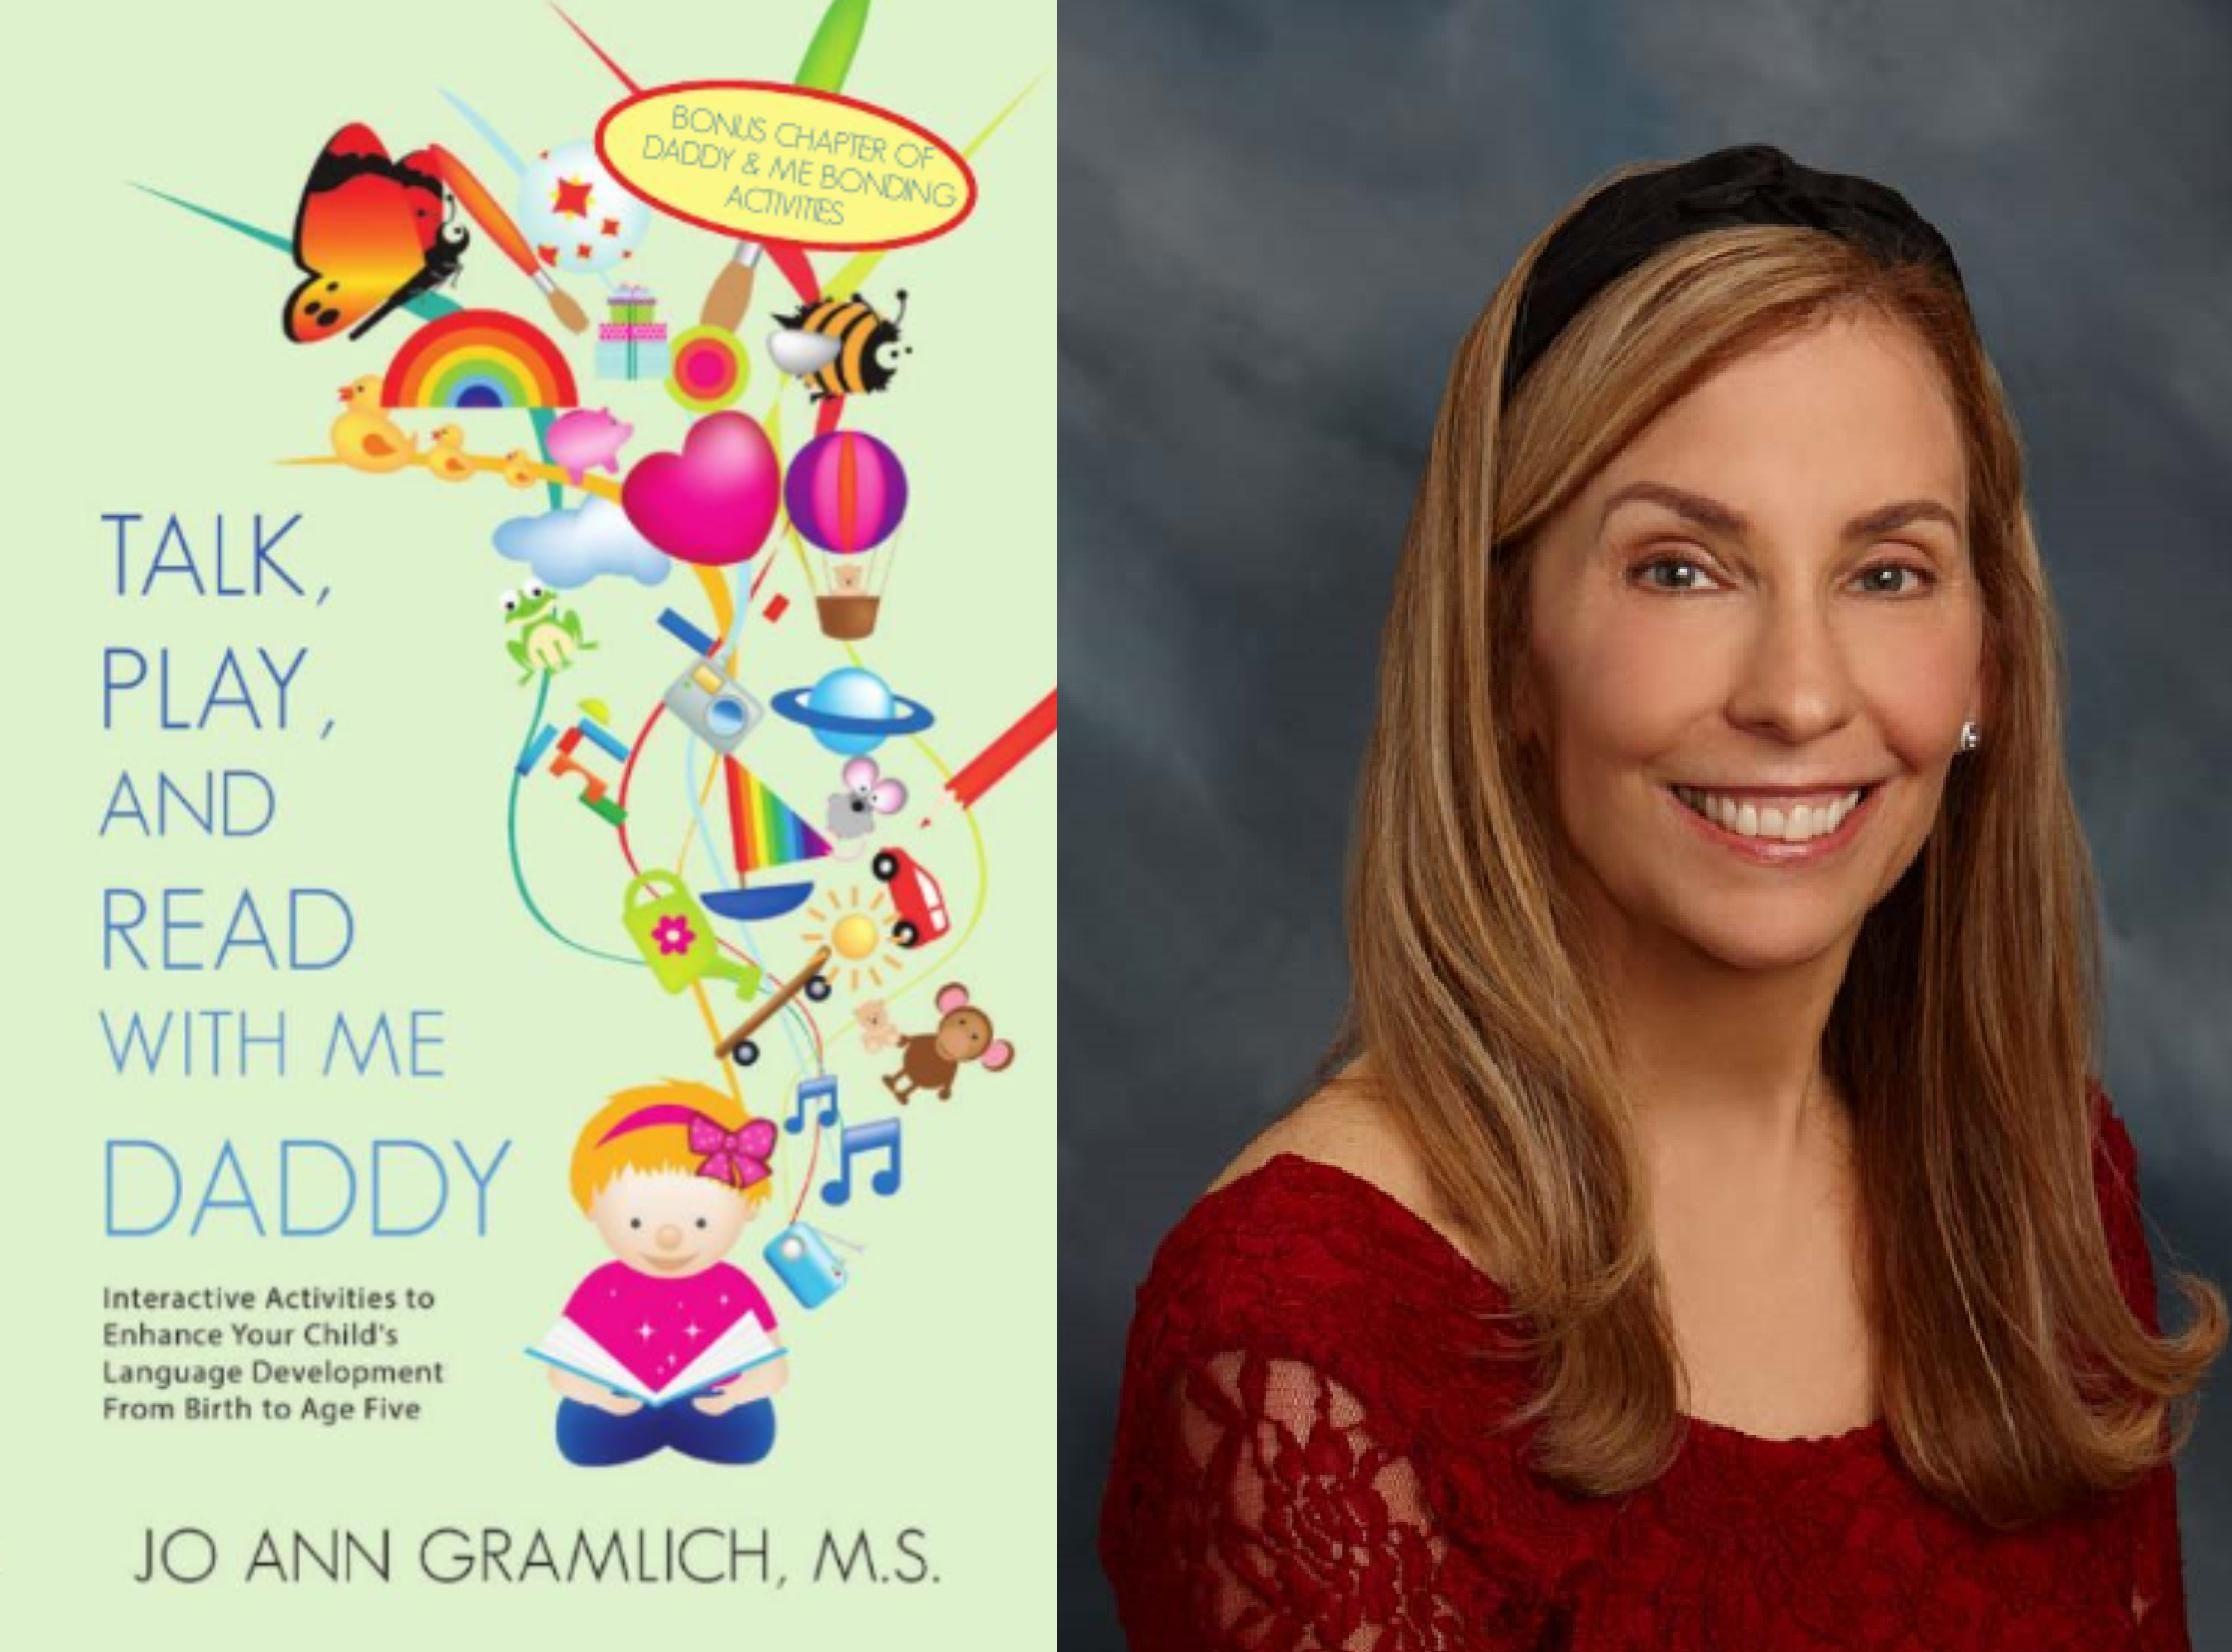 Daddy book & Jo Ann Gramlich